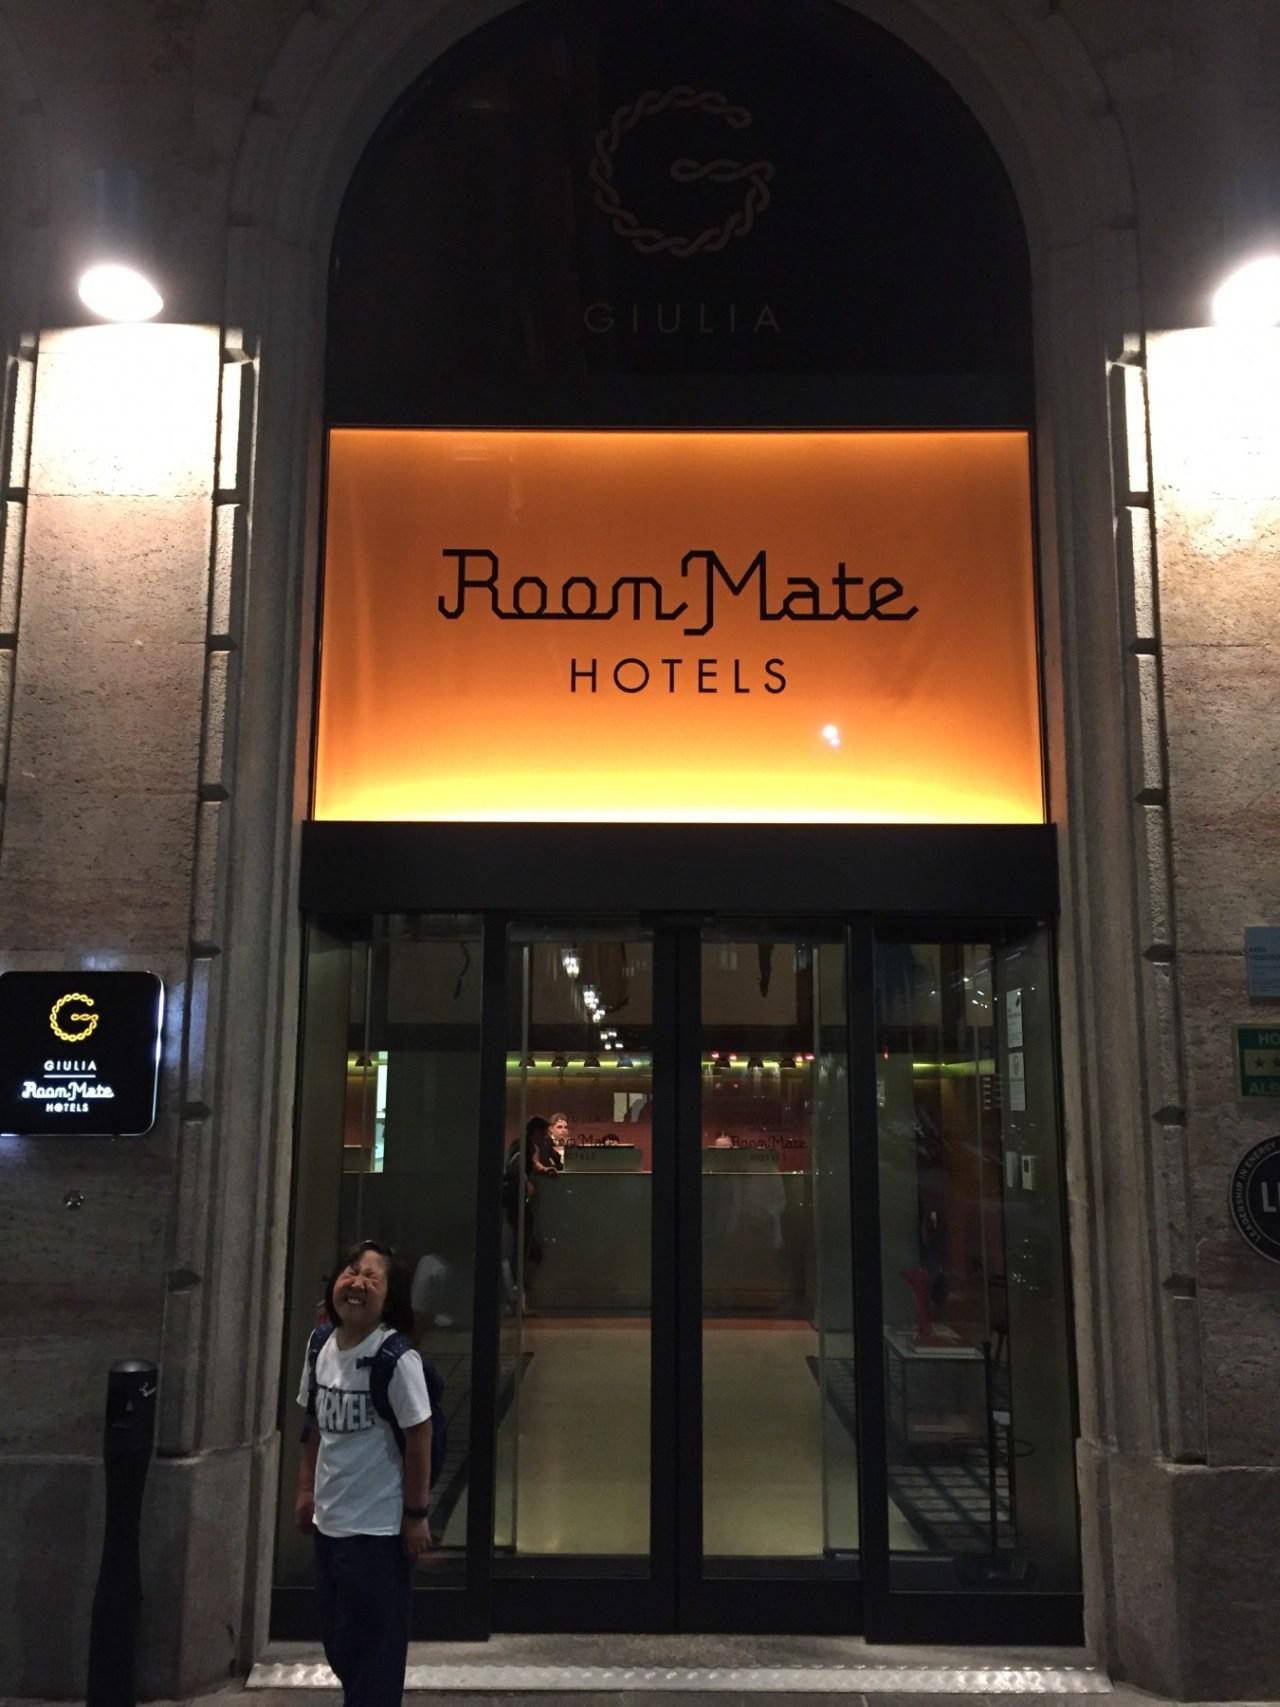 Room Mate Giulia ミラノ ルームメイト ジュリア